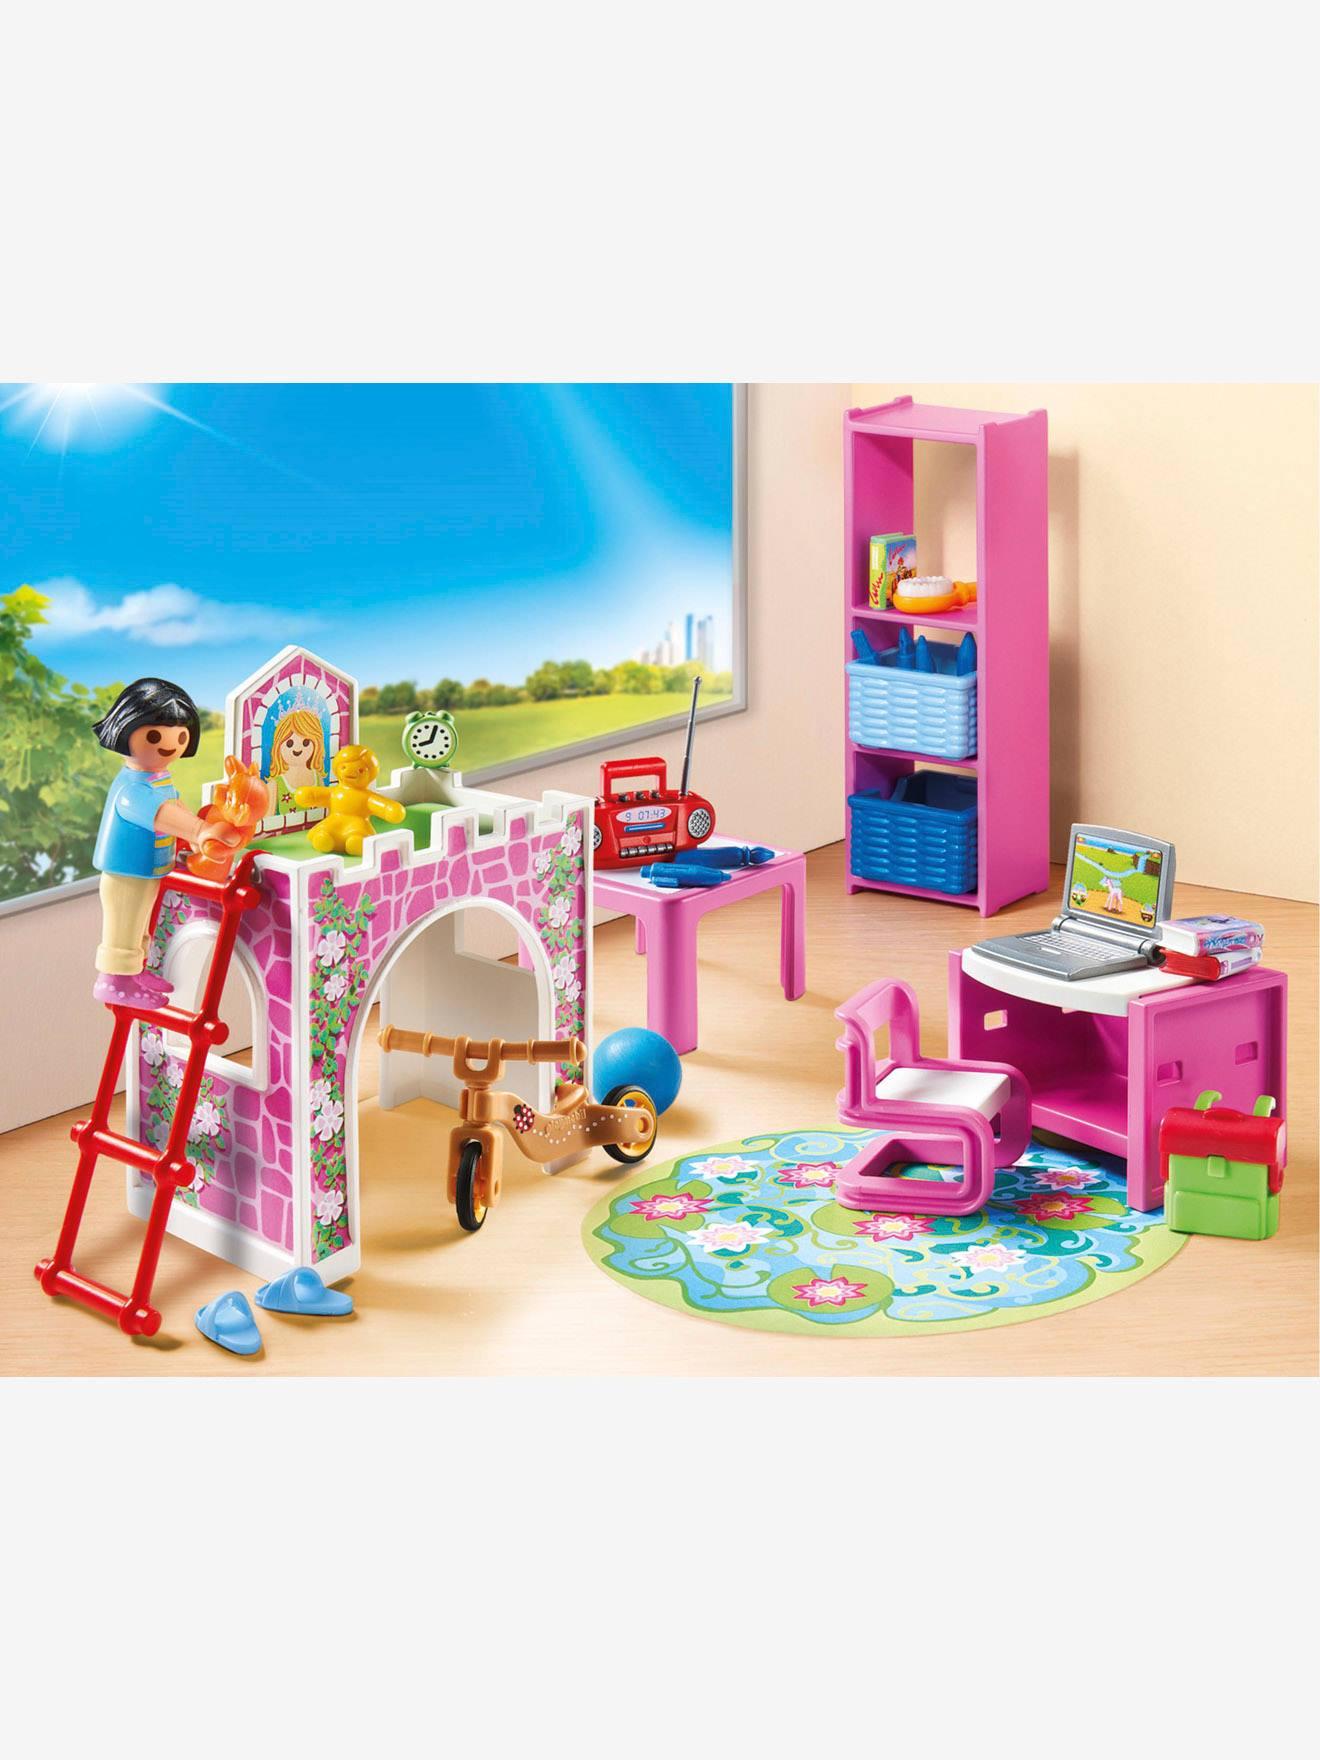 9270 Chambre d\'enfant Playmobil rose - Playmobil